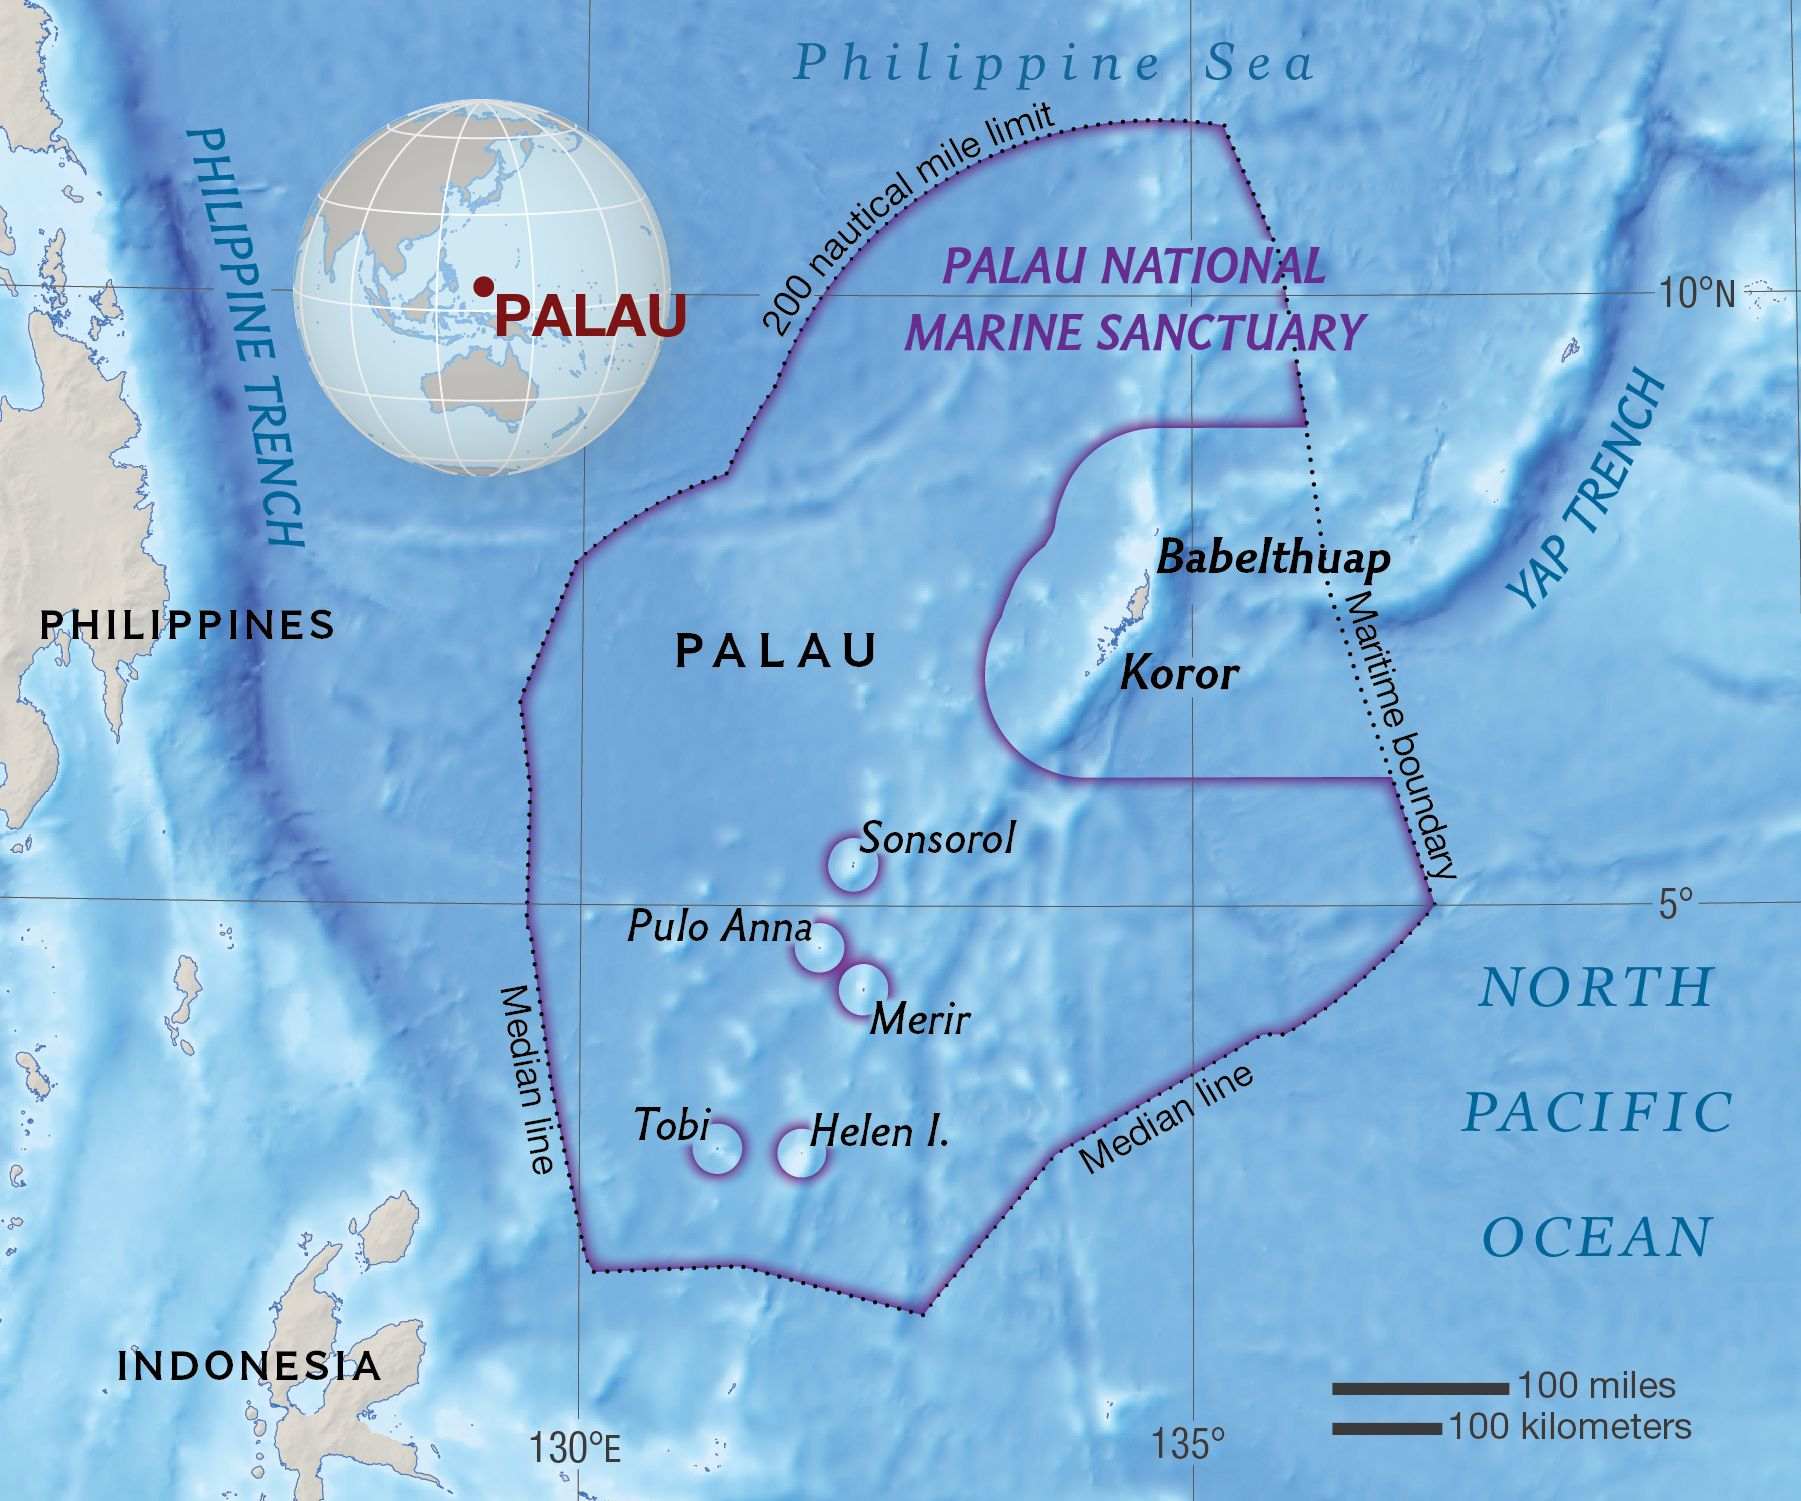 Palau National Geographic Society